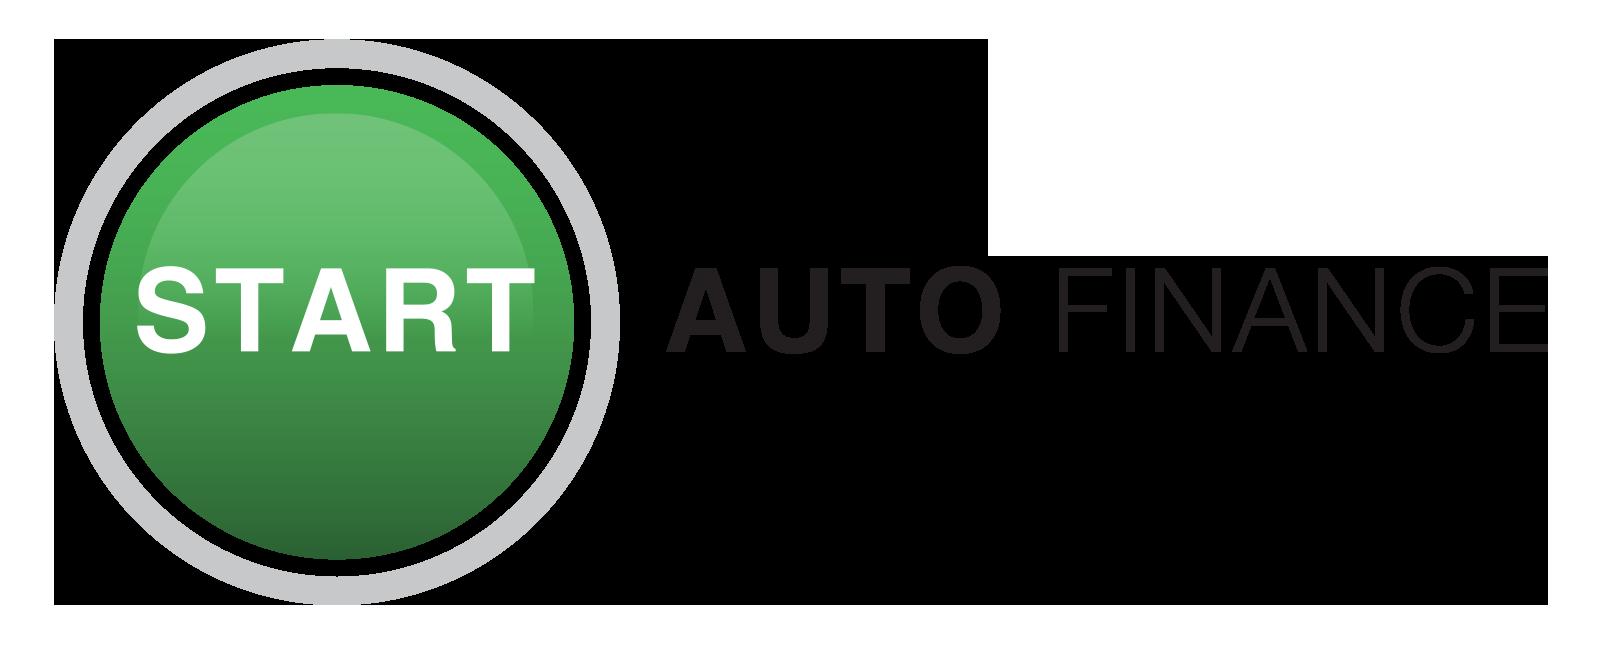 start-auto-finance-logo